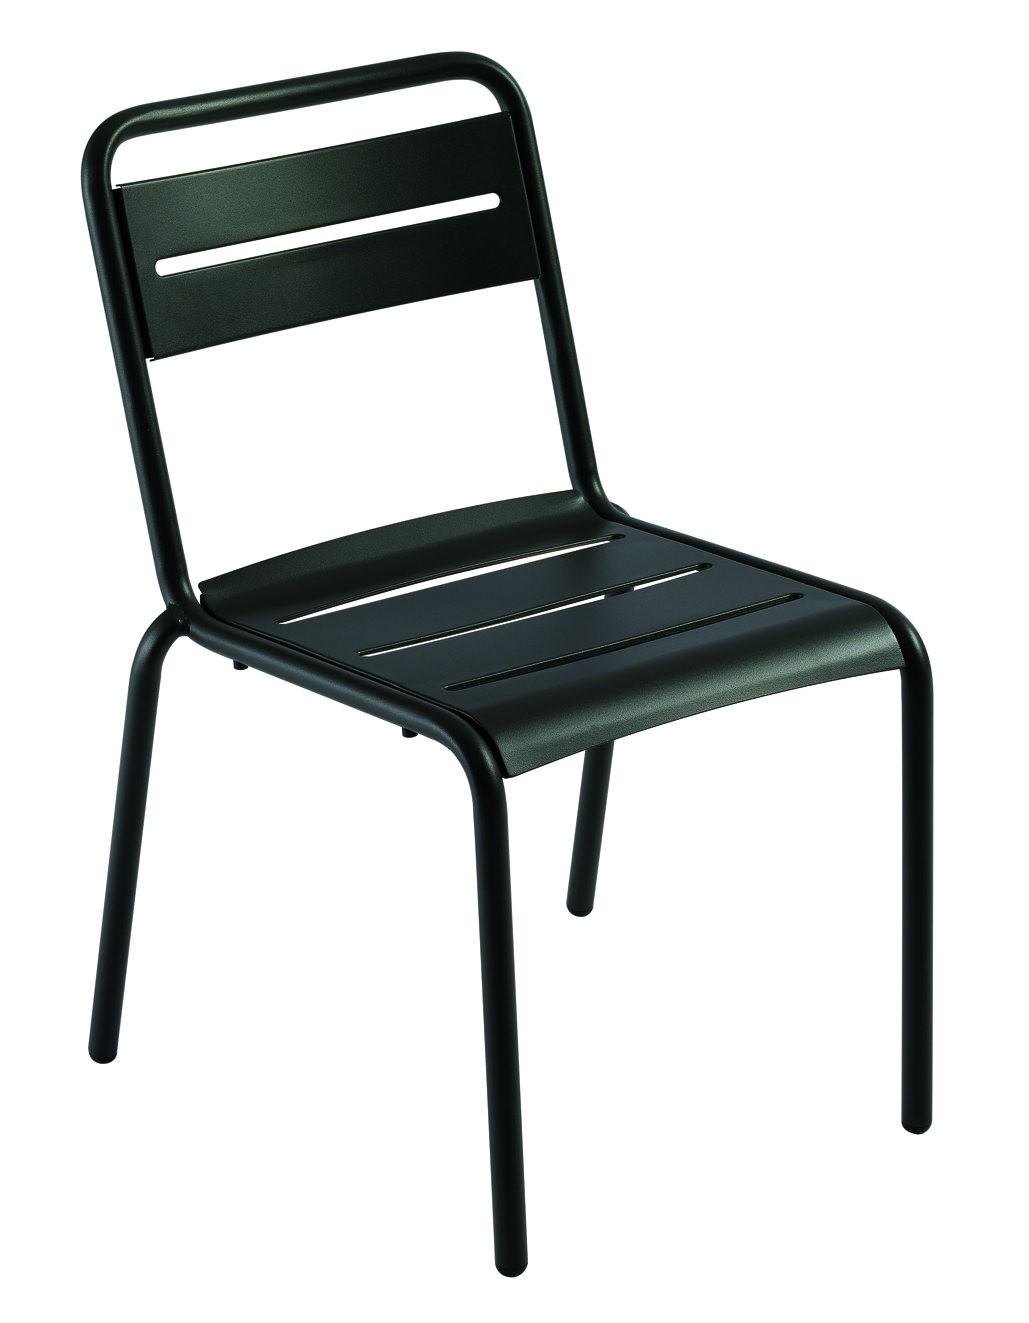 chaise star de emu 10 coloris. Black Bedroom Furniture Sets. Home Design Ideas